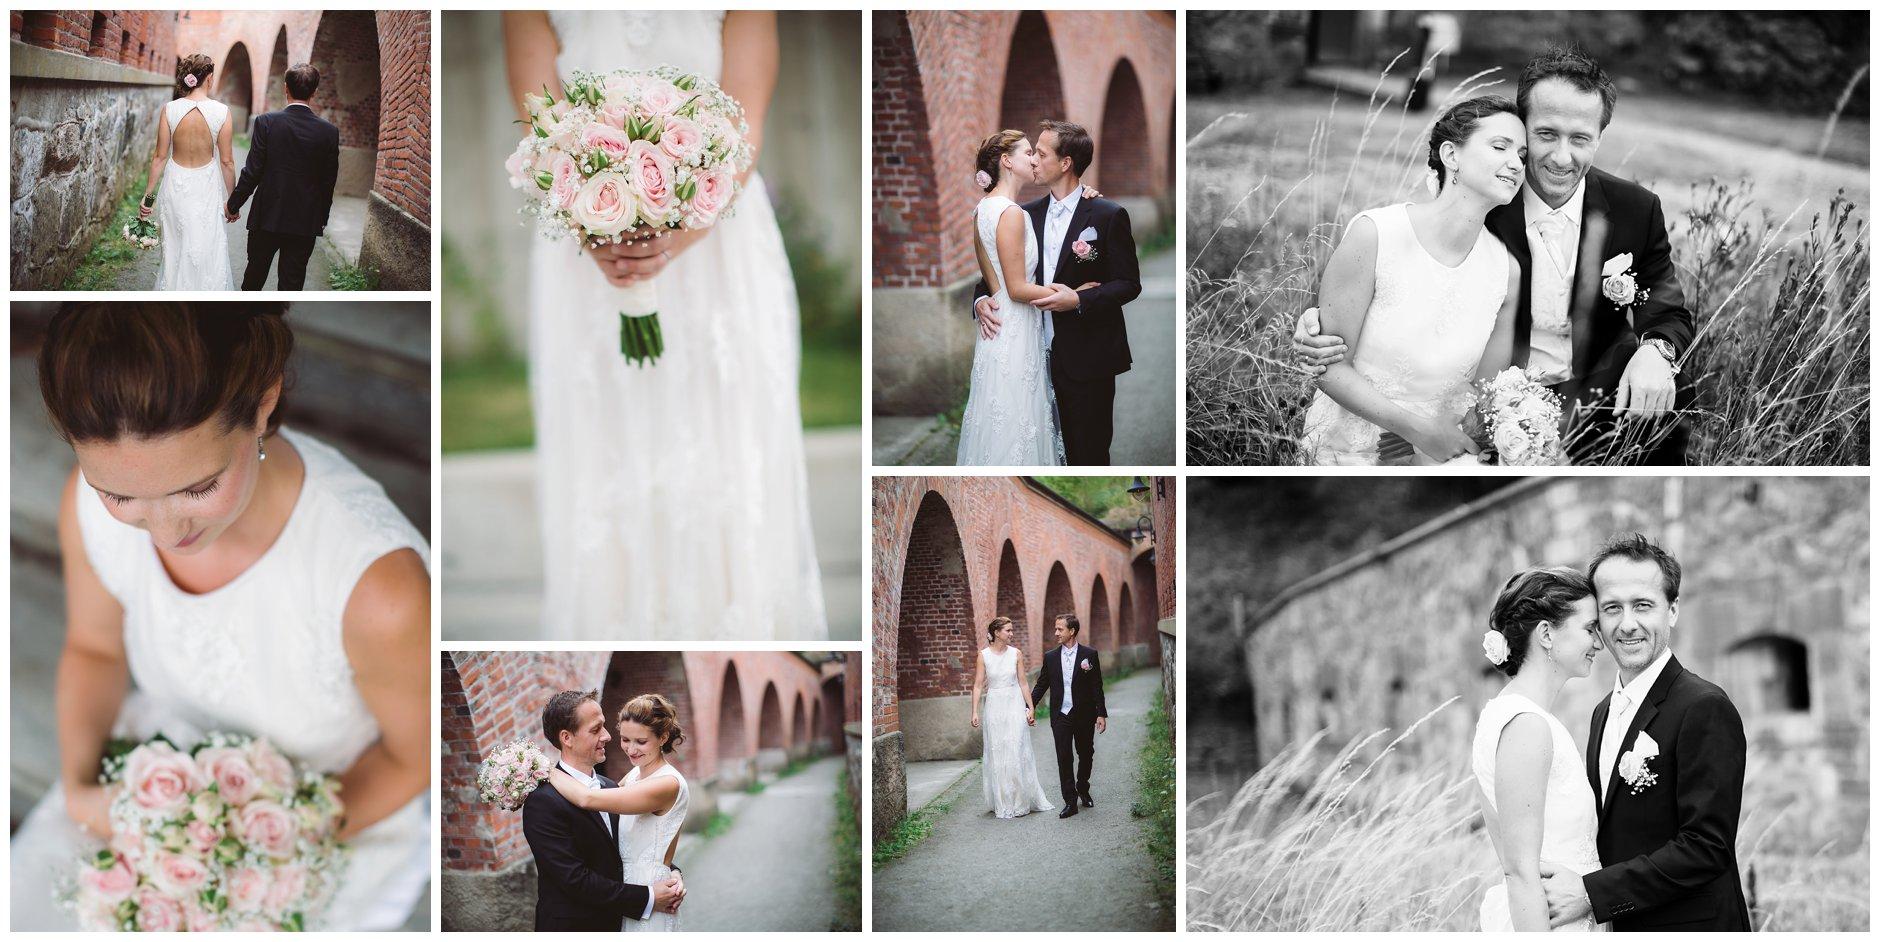 Bryllup på Oscarsborg i Drøbak